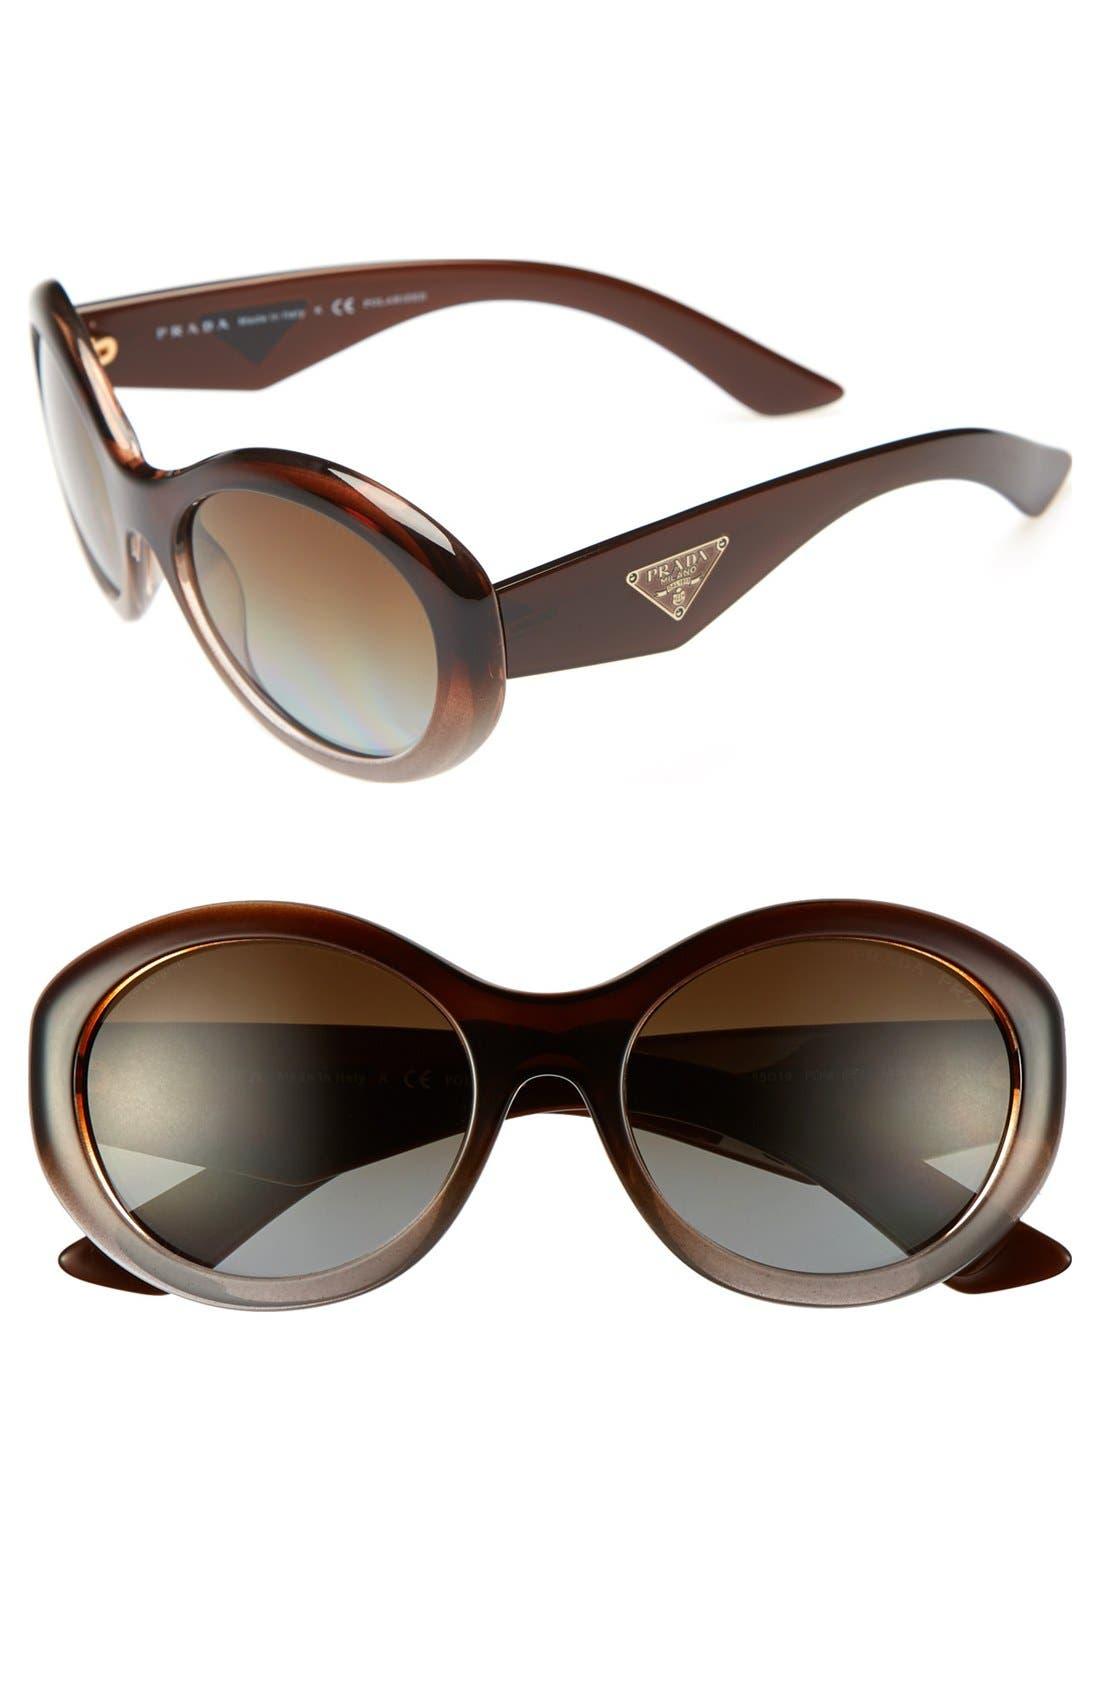 Main Image - Prada 'Oval Glam' 55mm Polarized Sunglasses